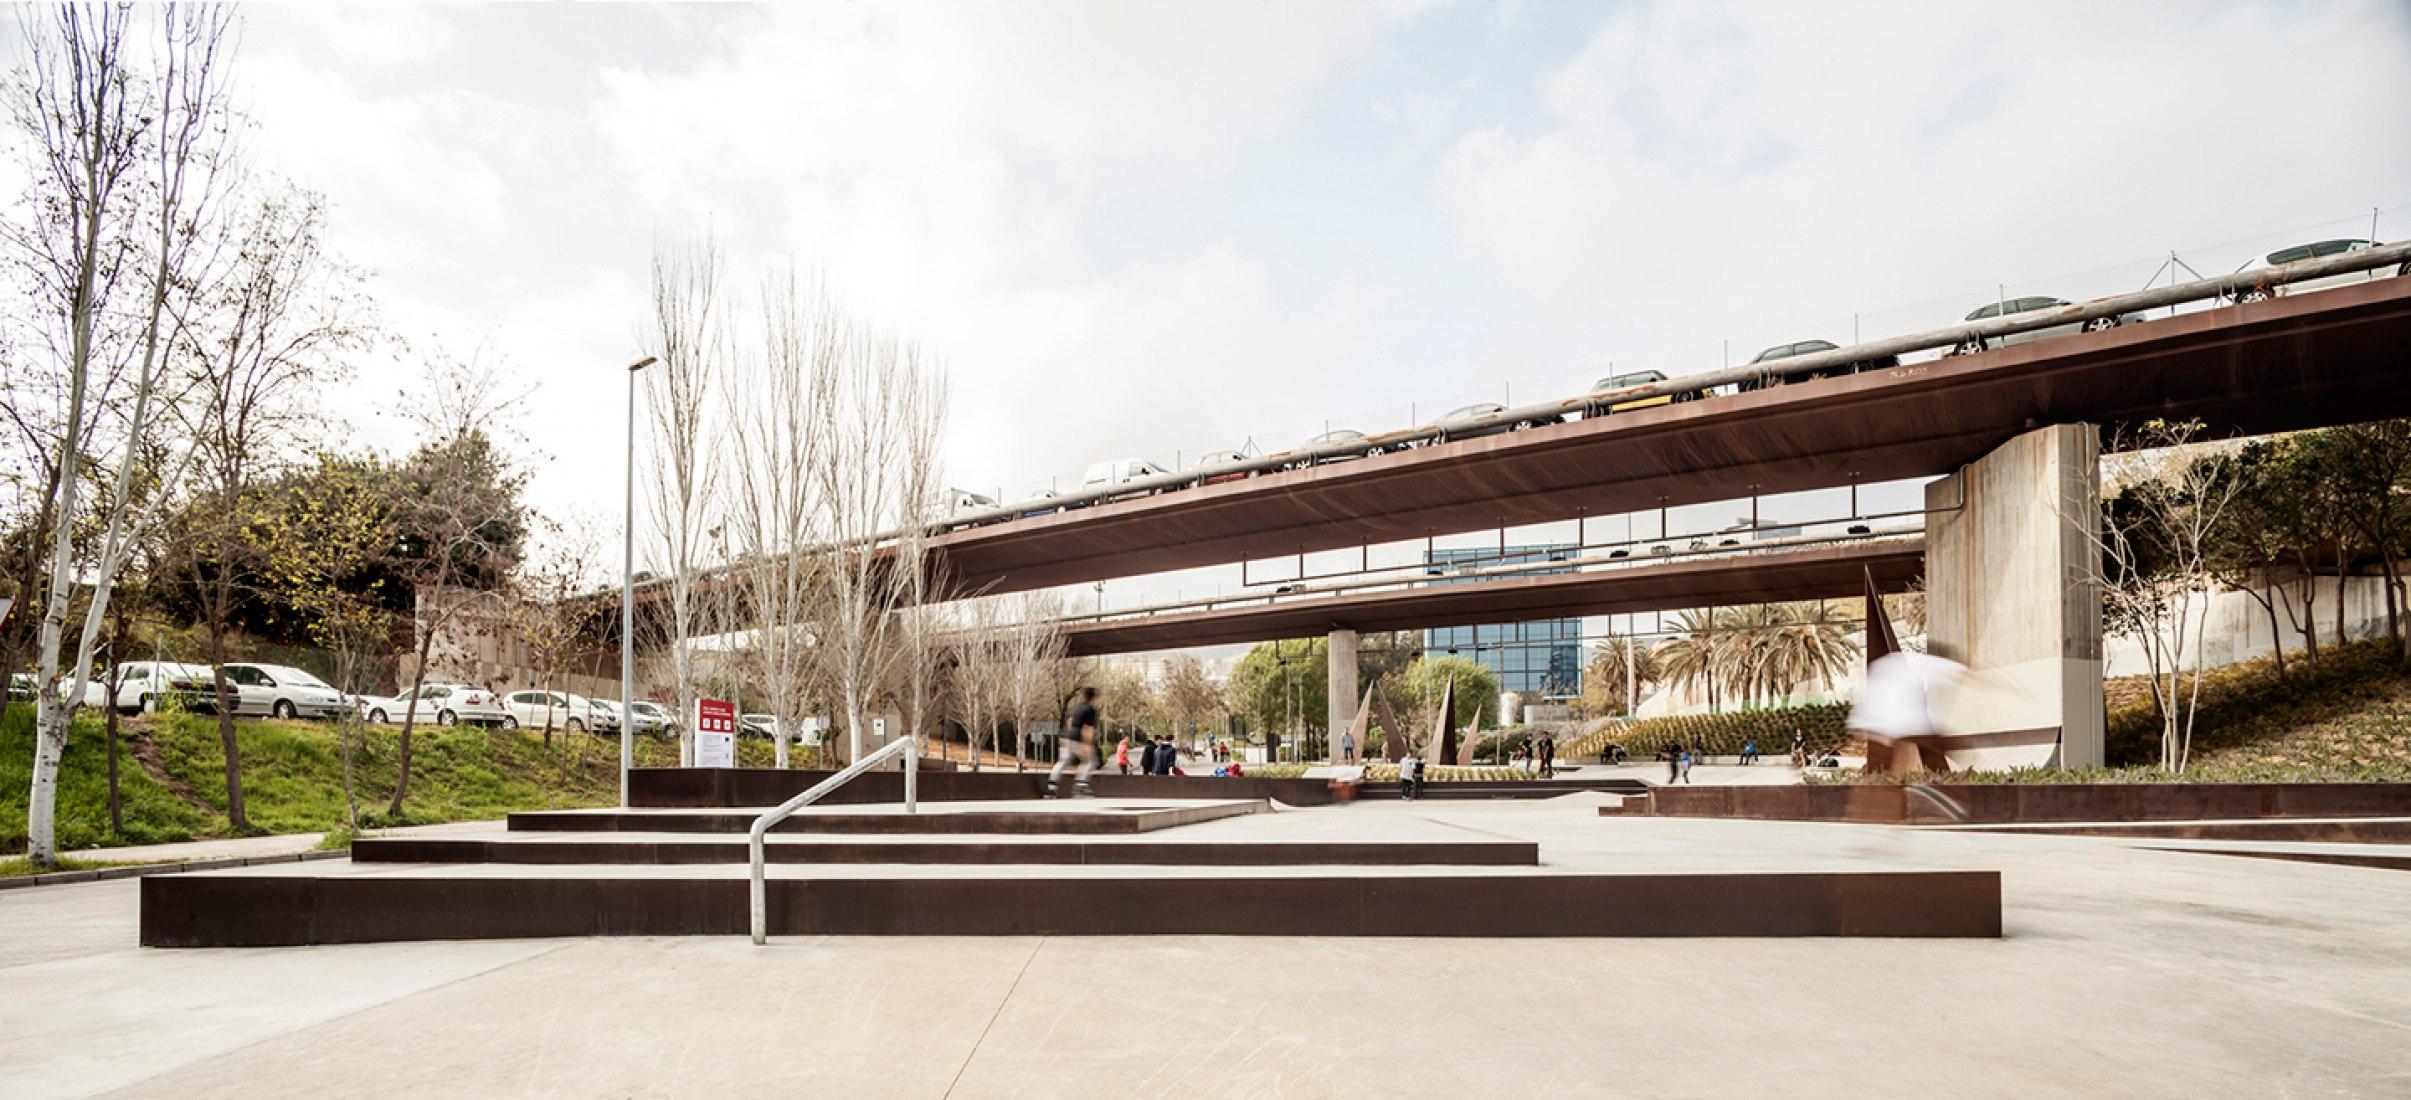 Aureà Cuadrado Urban Sports Park by SCOB Arquitectura y Paisaje. Photograph © Adrià Goula.